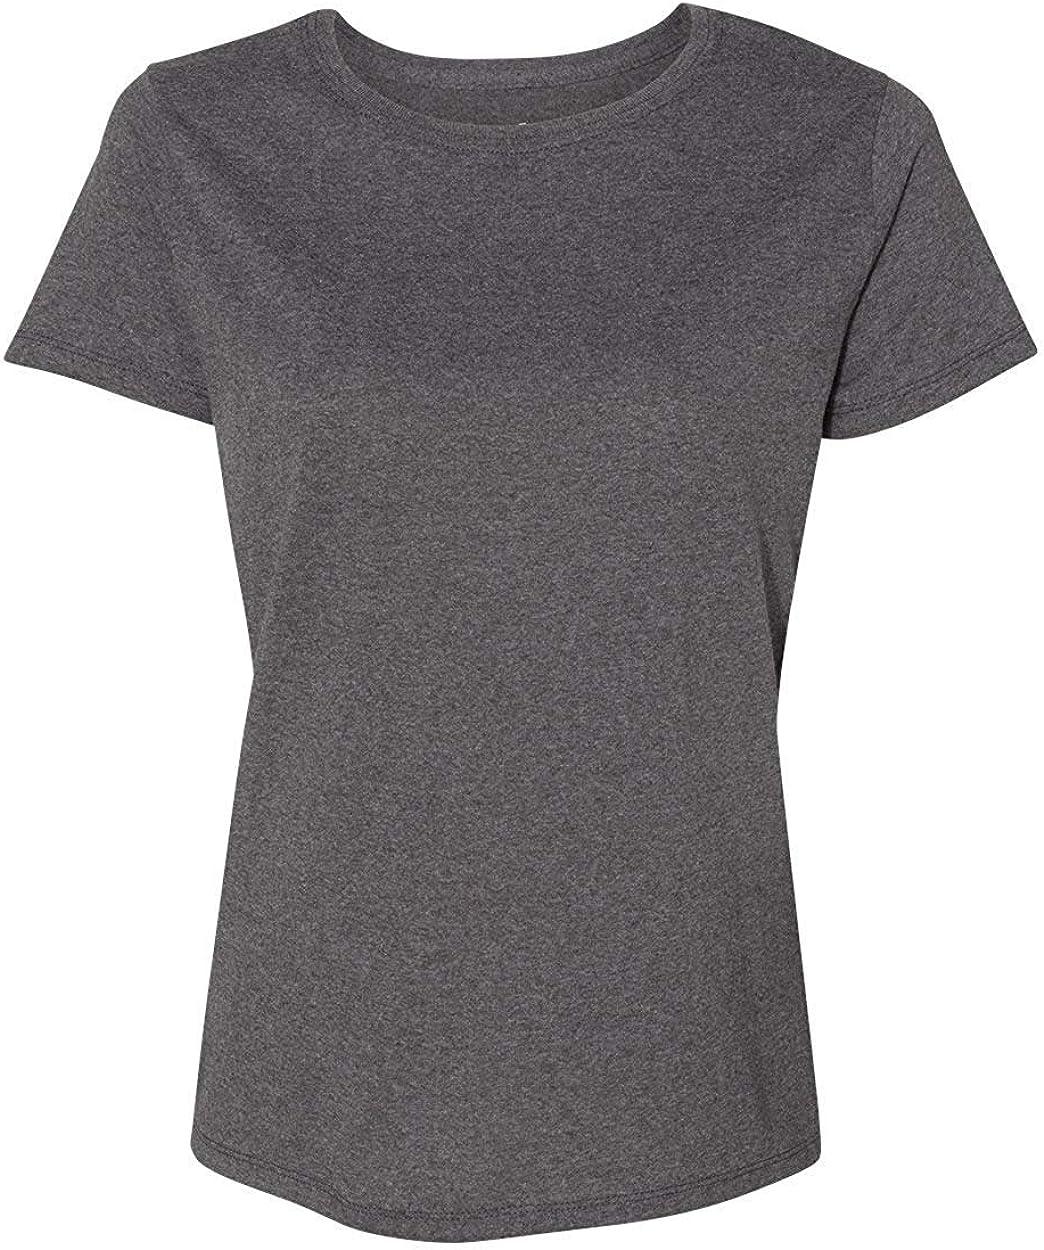 Hanes Women's Relaxed Fit Jersey ComfortSof Crewneck T-Shirt